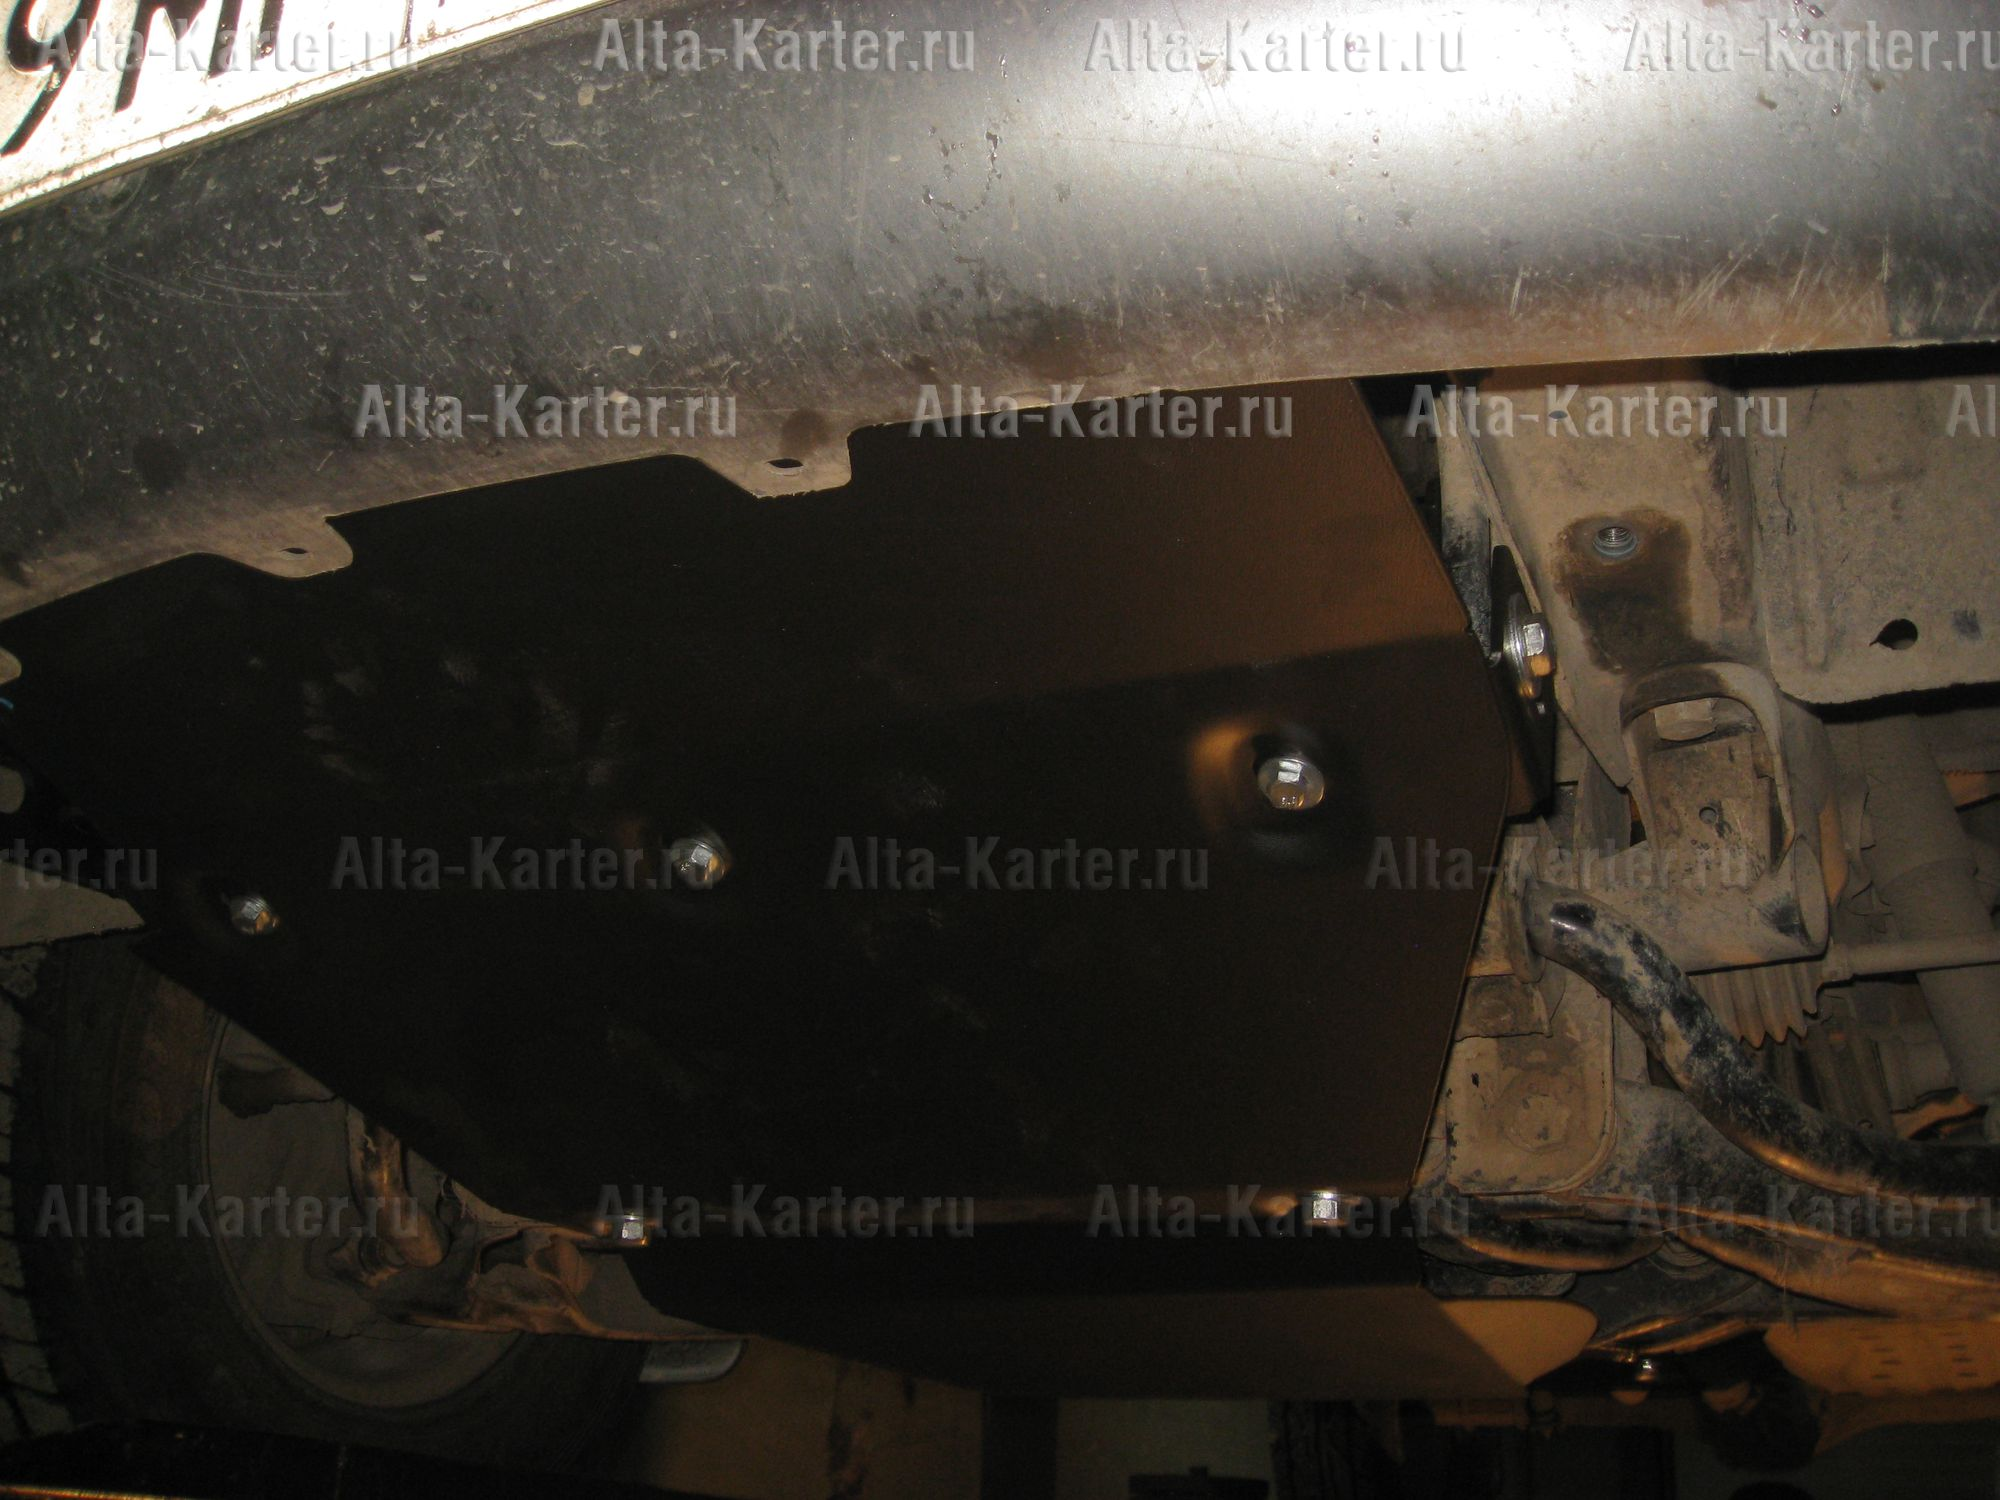 Защита Alfeco для картера и радиатора Mitsubishi Delica IV D4 1996-2007. Артикул ALF.14.32